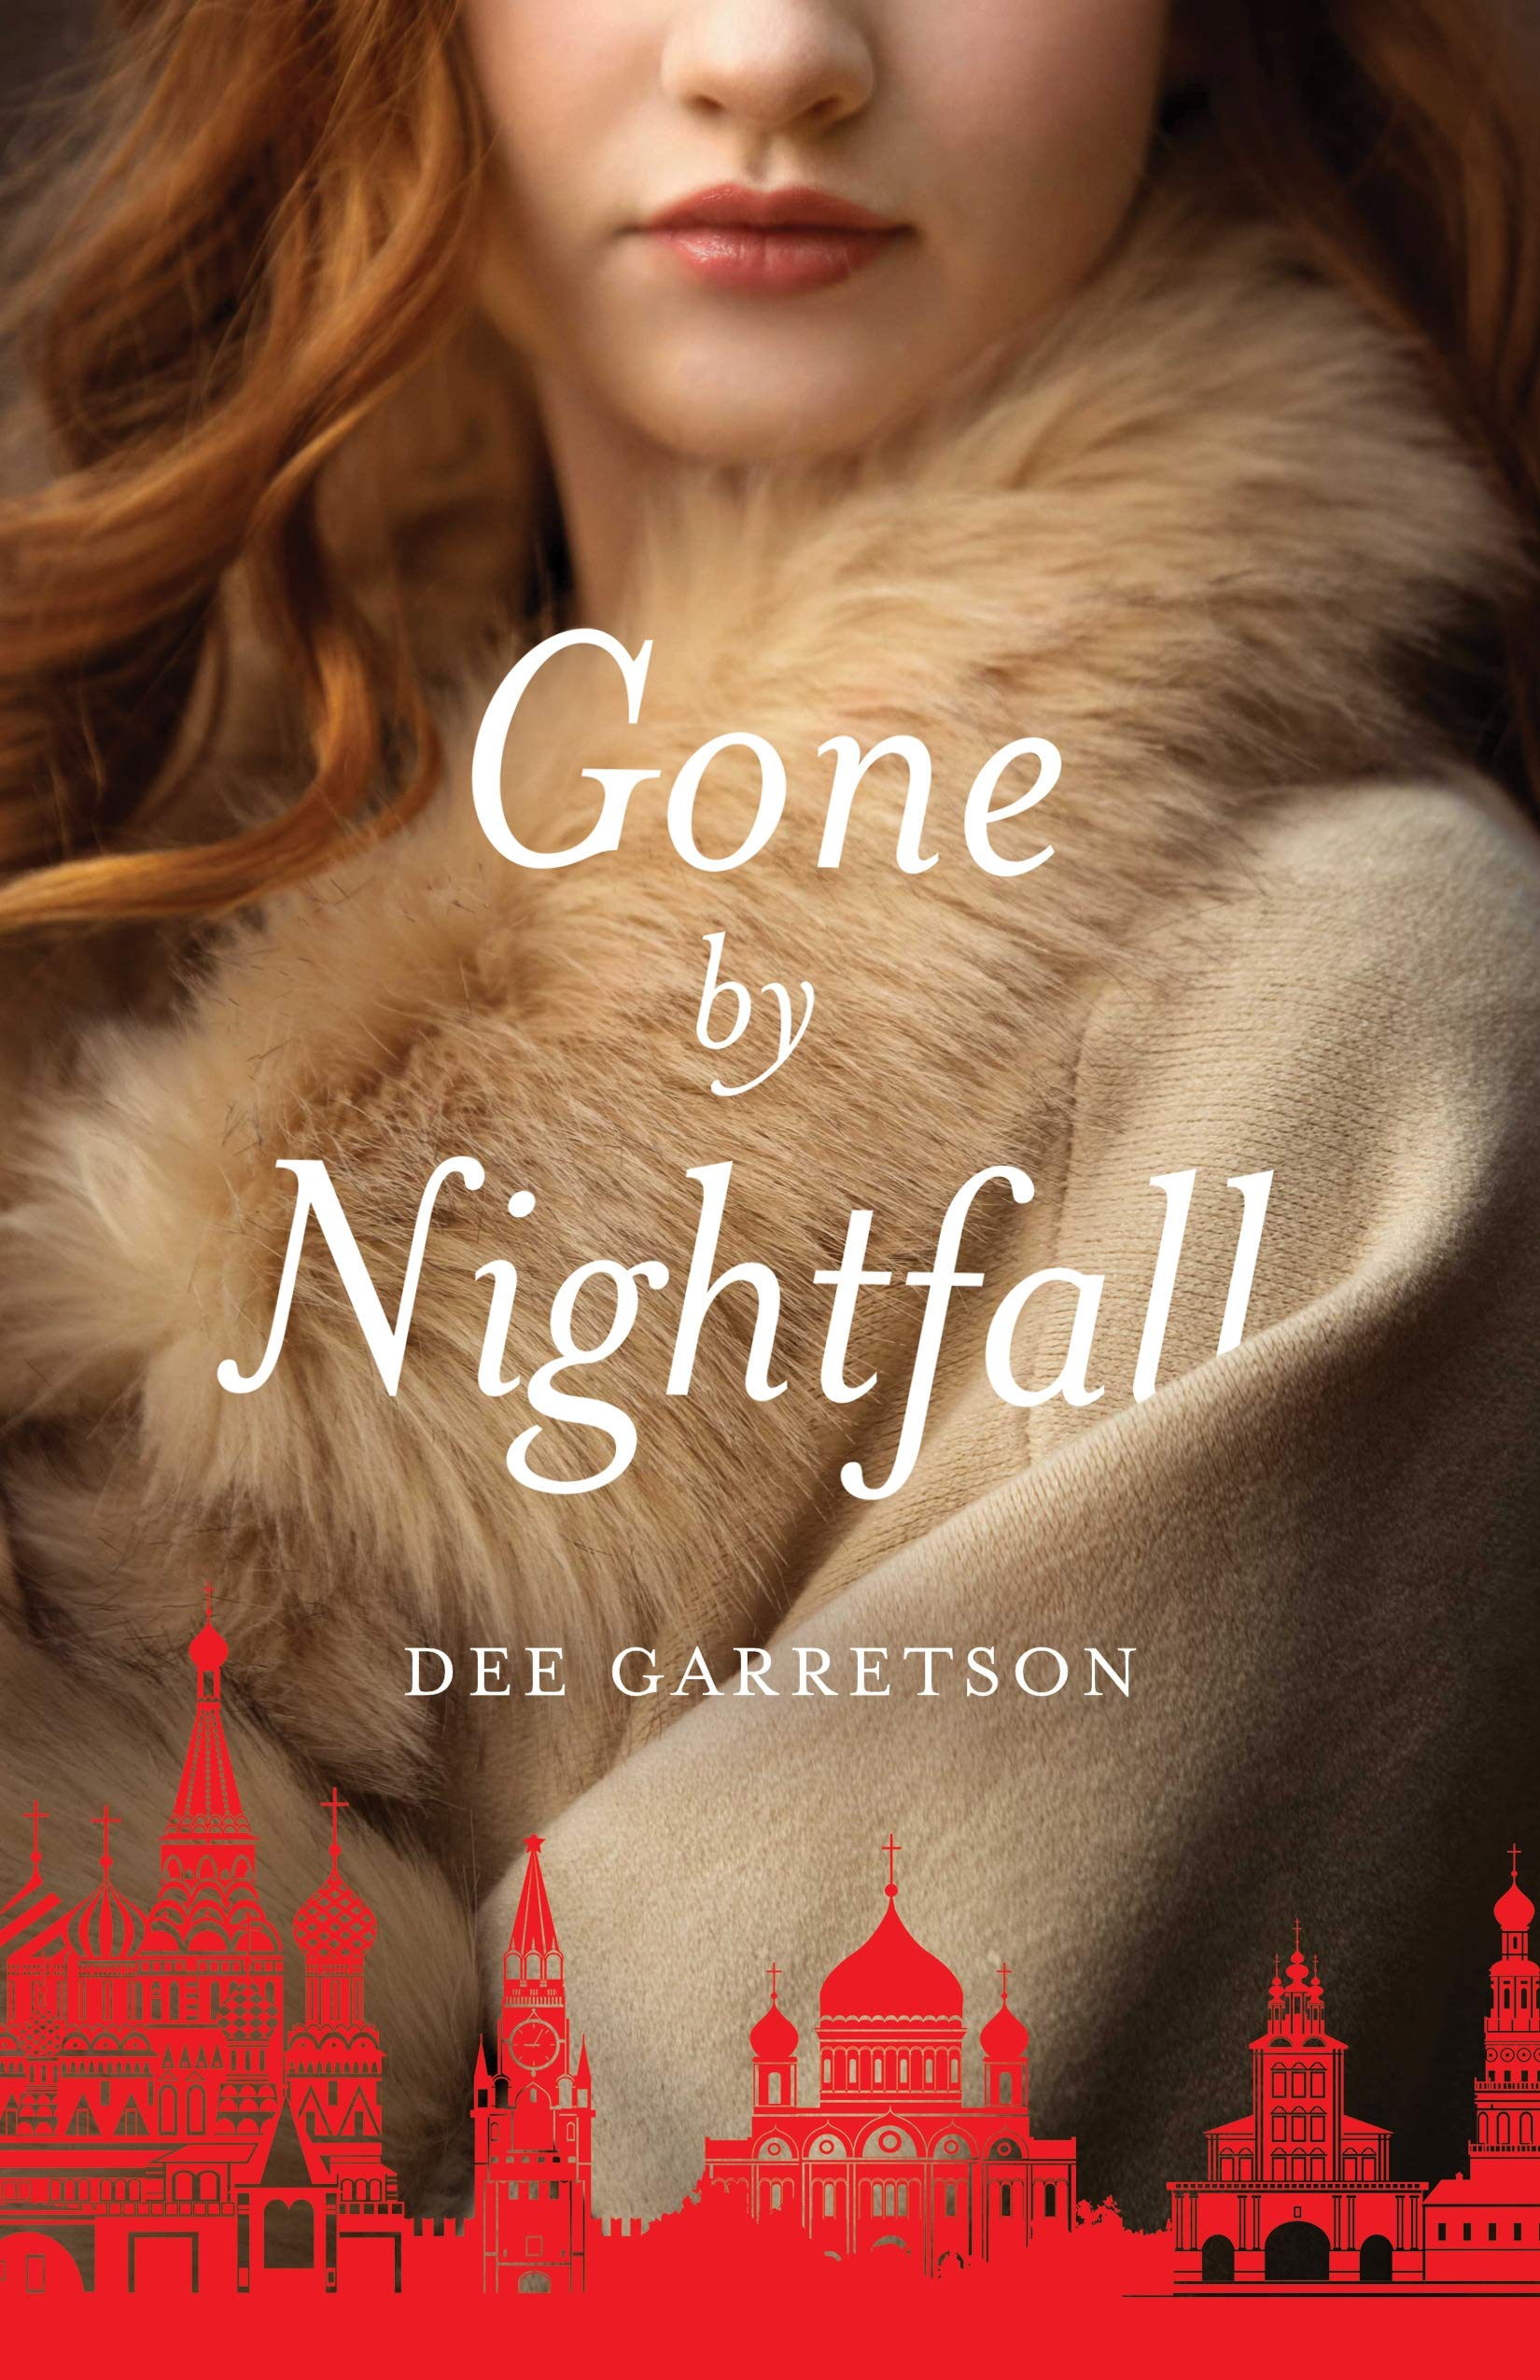 Gone by Nightfall by Dee Garretson